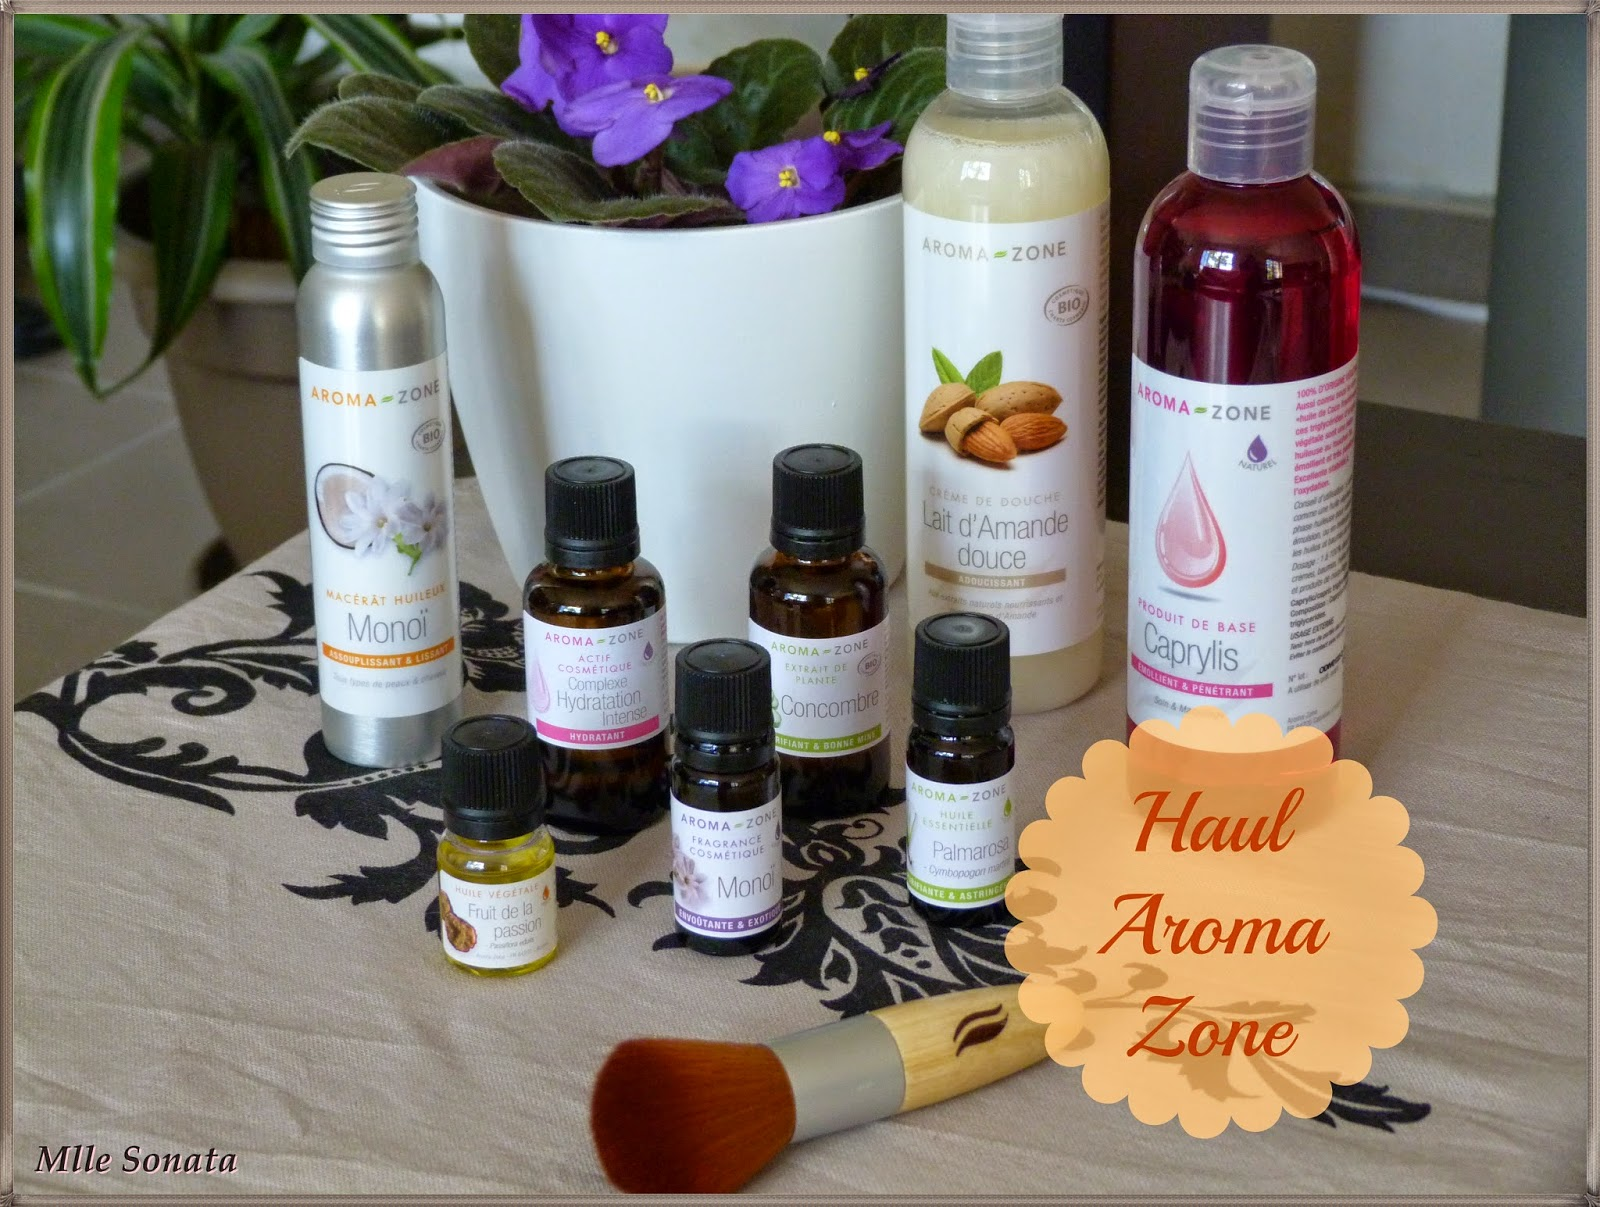 Haul Aroma Zone